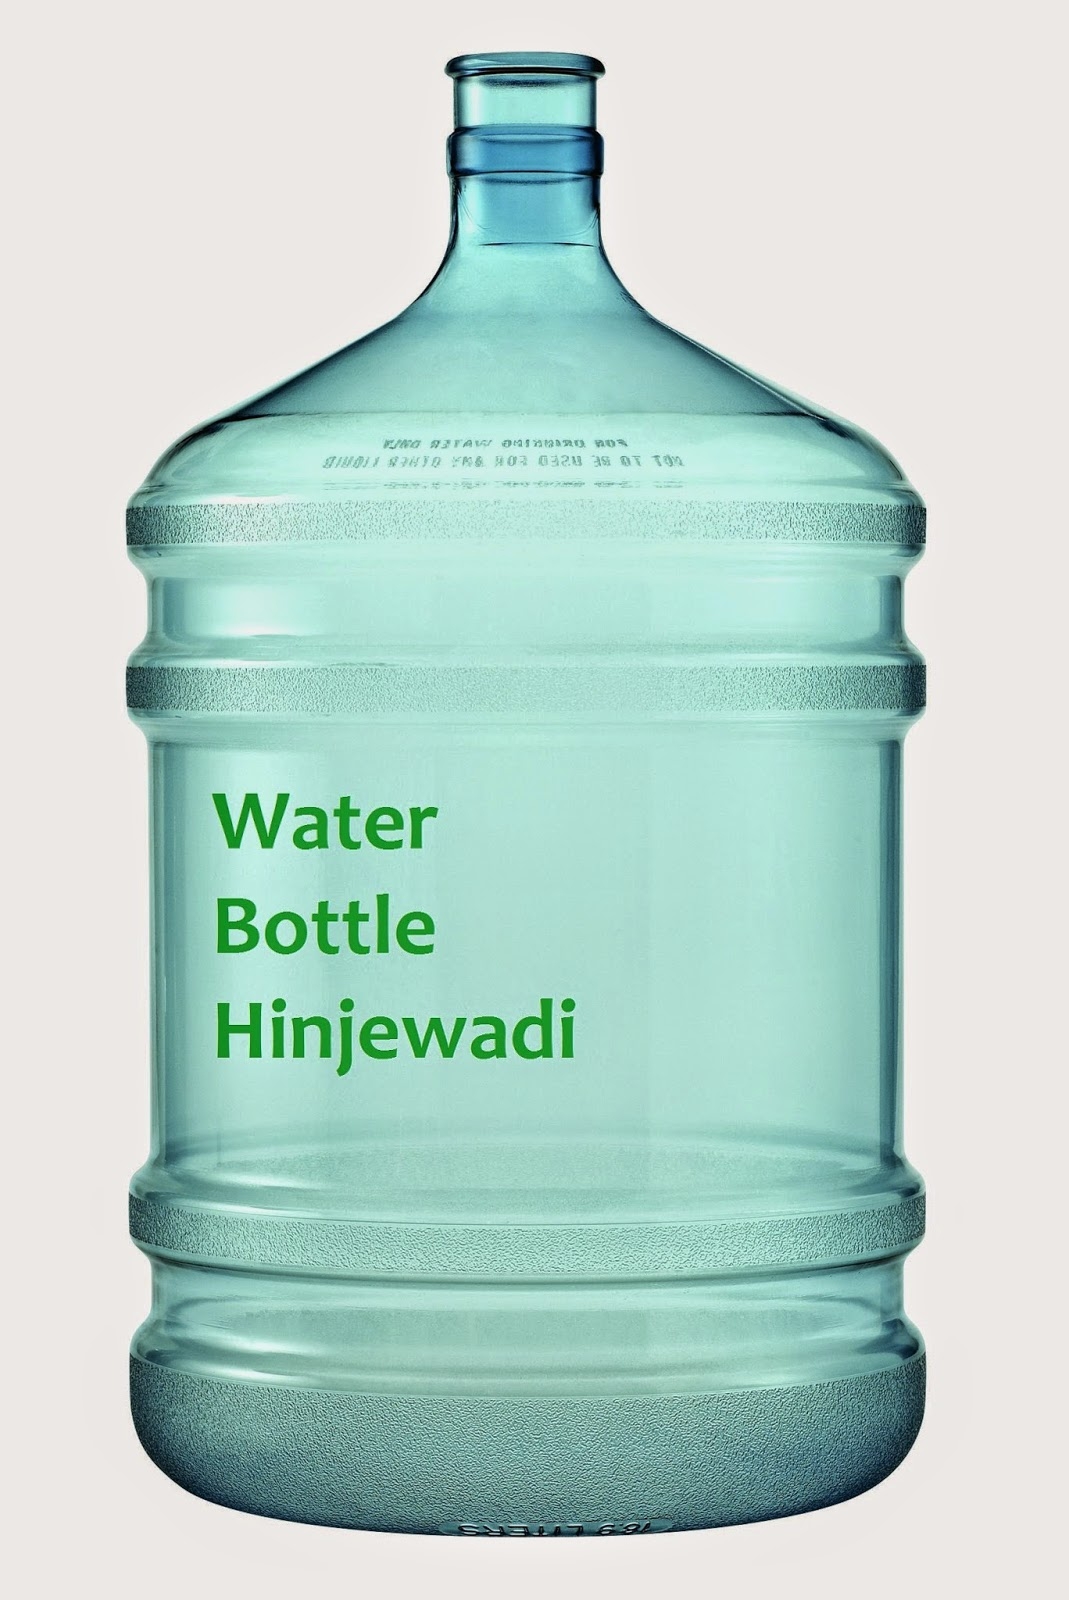 -qU1zCL69yVs/VWQpI_e2vEI/AAAAAAAAFXI/zTjZl8kMCHE/s1600/water-bottle-sparklet-splendor-sunway-megapolis-contact-mobile-10alone_vikrmn_author_ca_vikram_verma